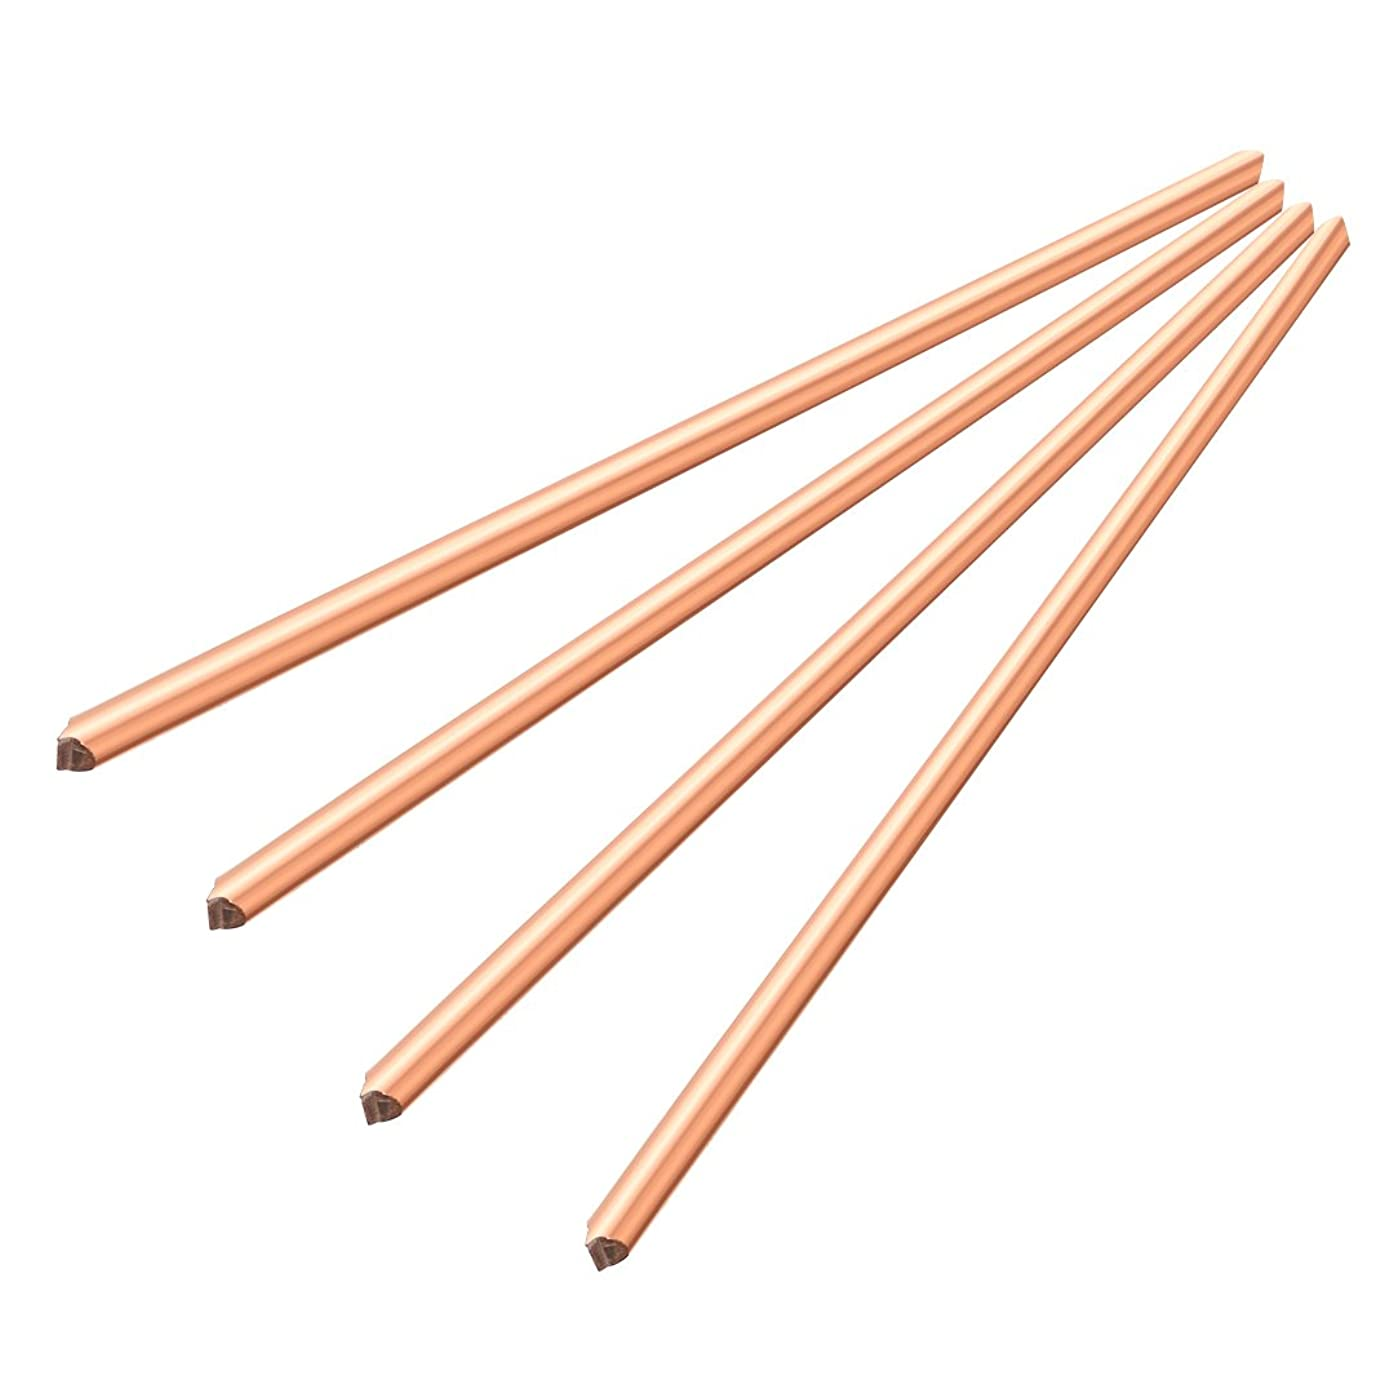 4 Pcs Copper Rod Round Metal Tube Cylinder Bar Tool,200 mm x 6 mm